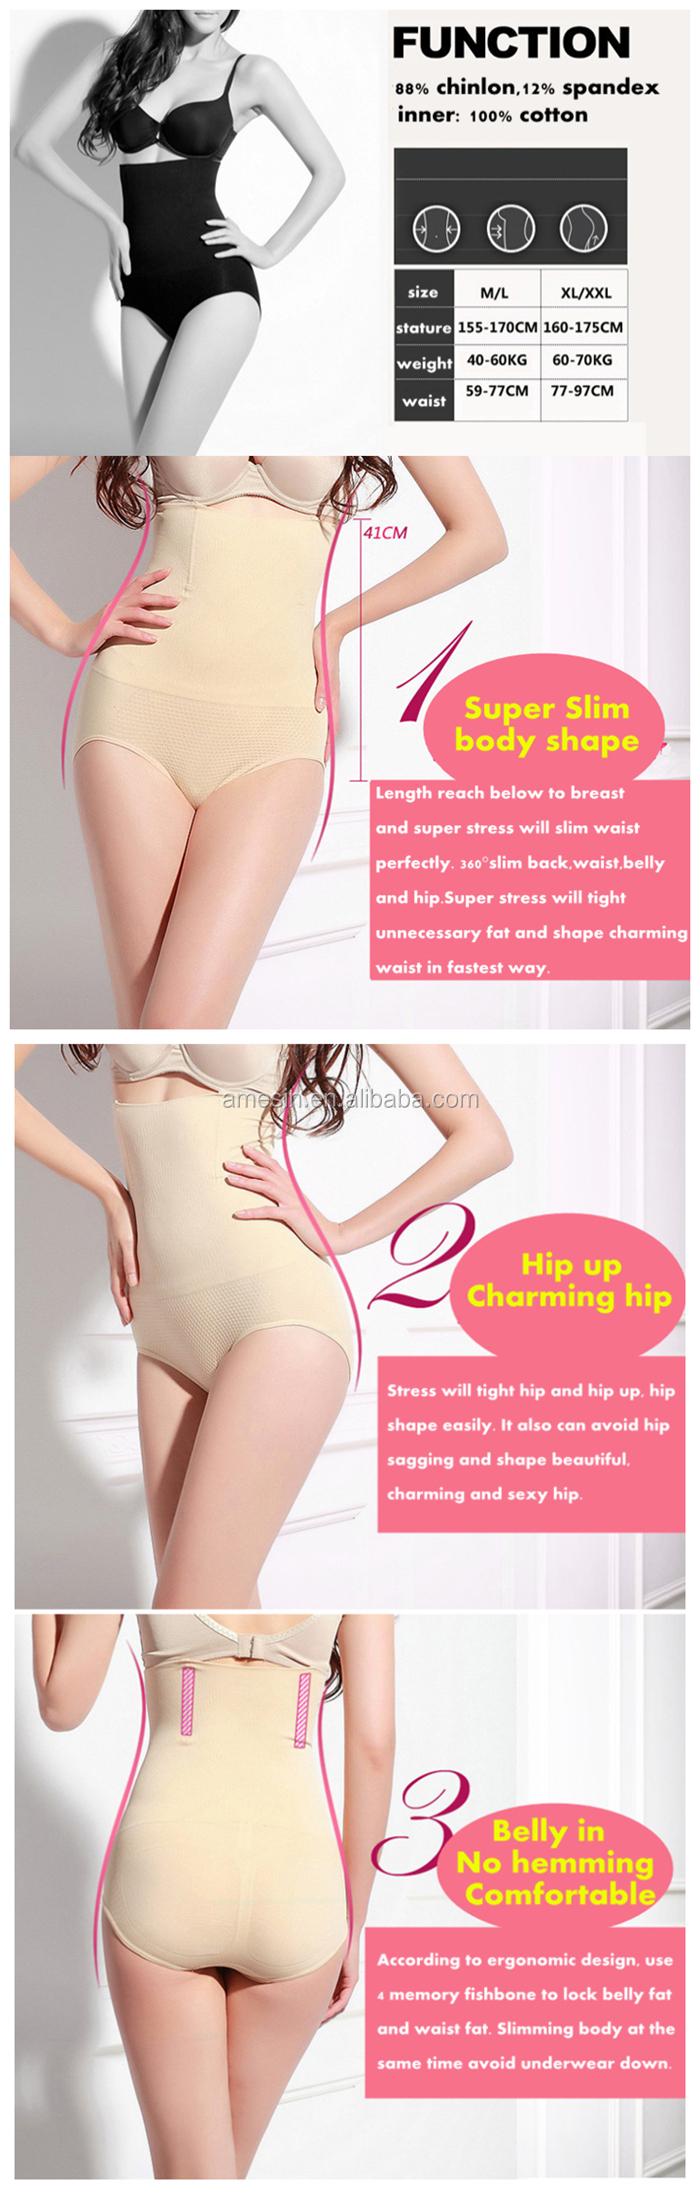 amesin slimming undergarments mature sexy panties high waist